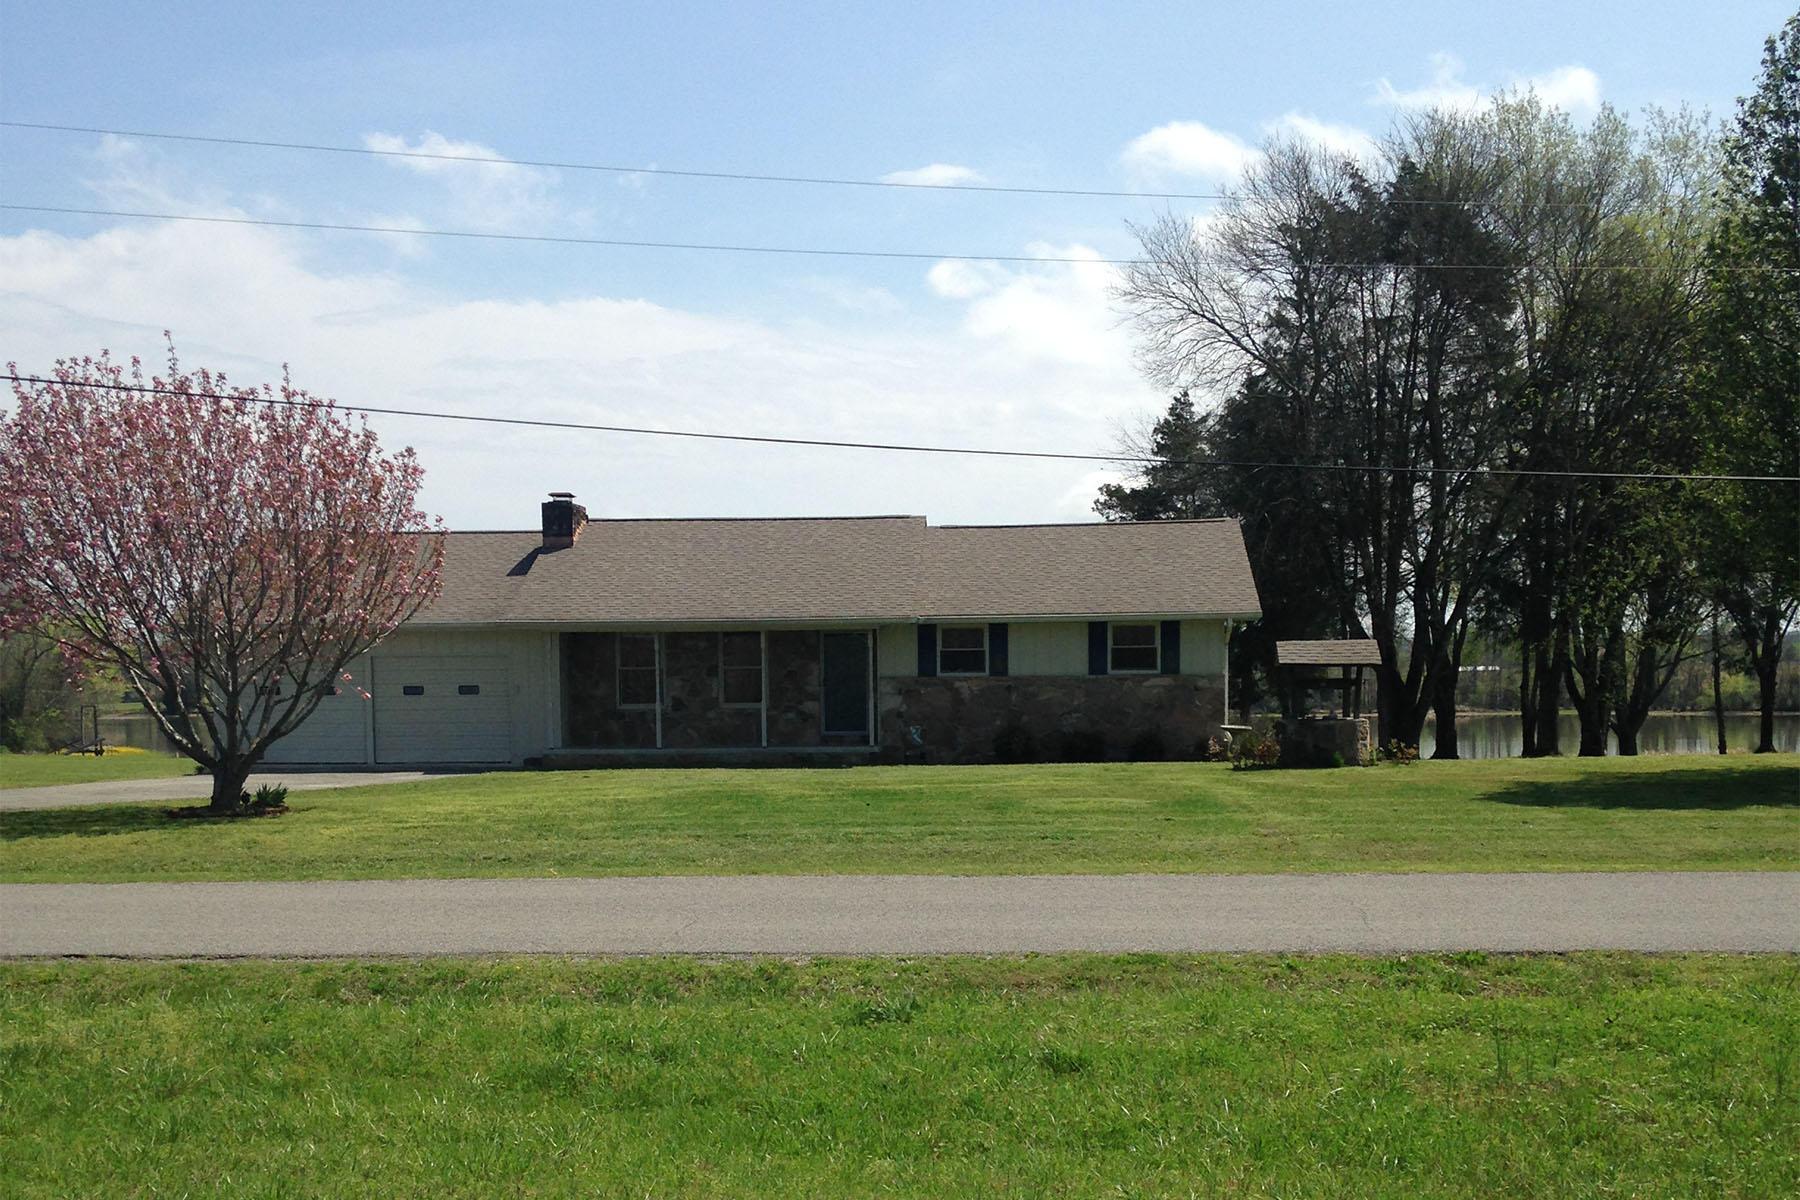 532 Housley Cir, Dayton, TN 37321